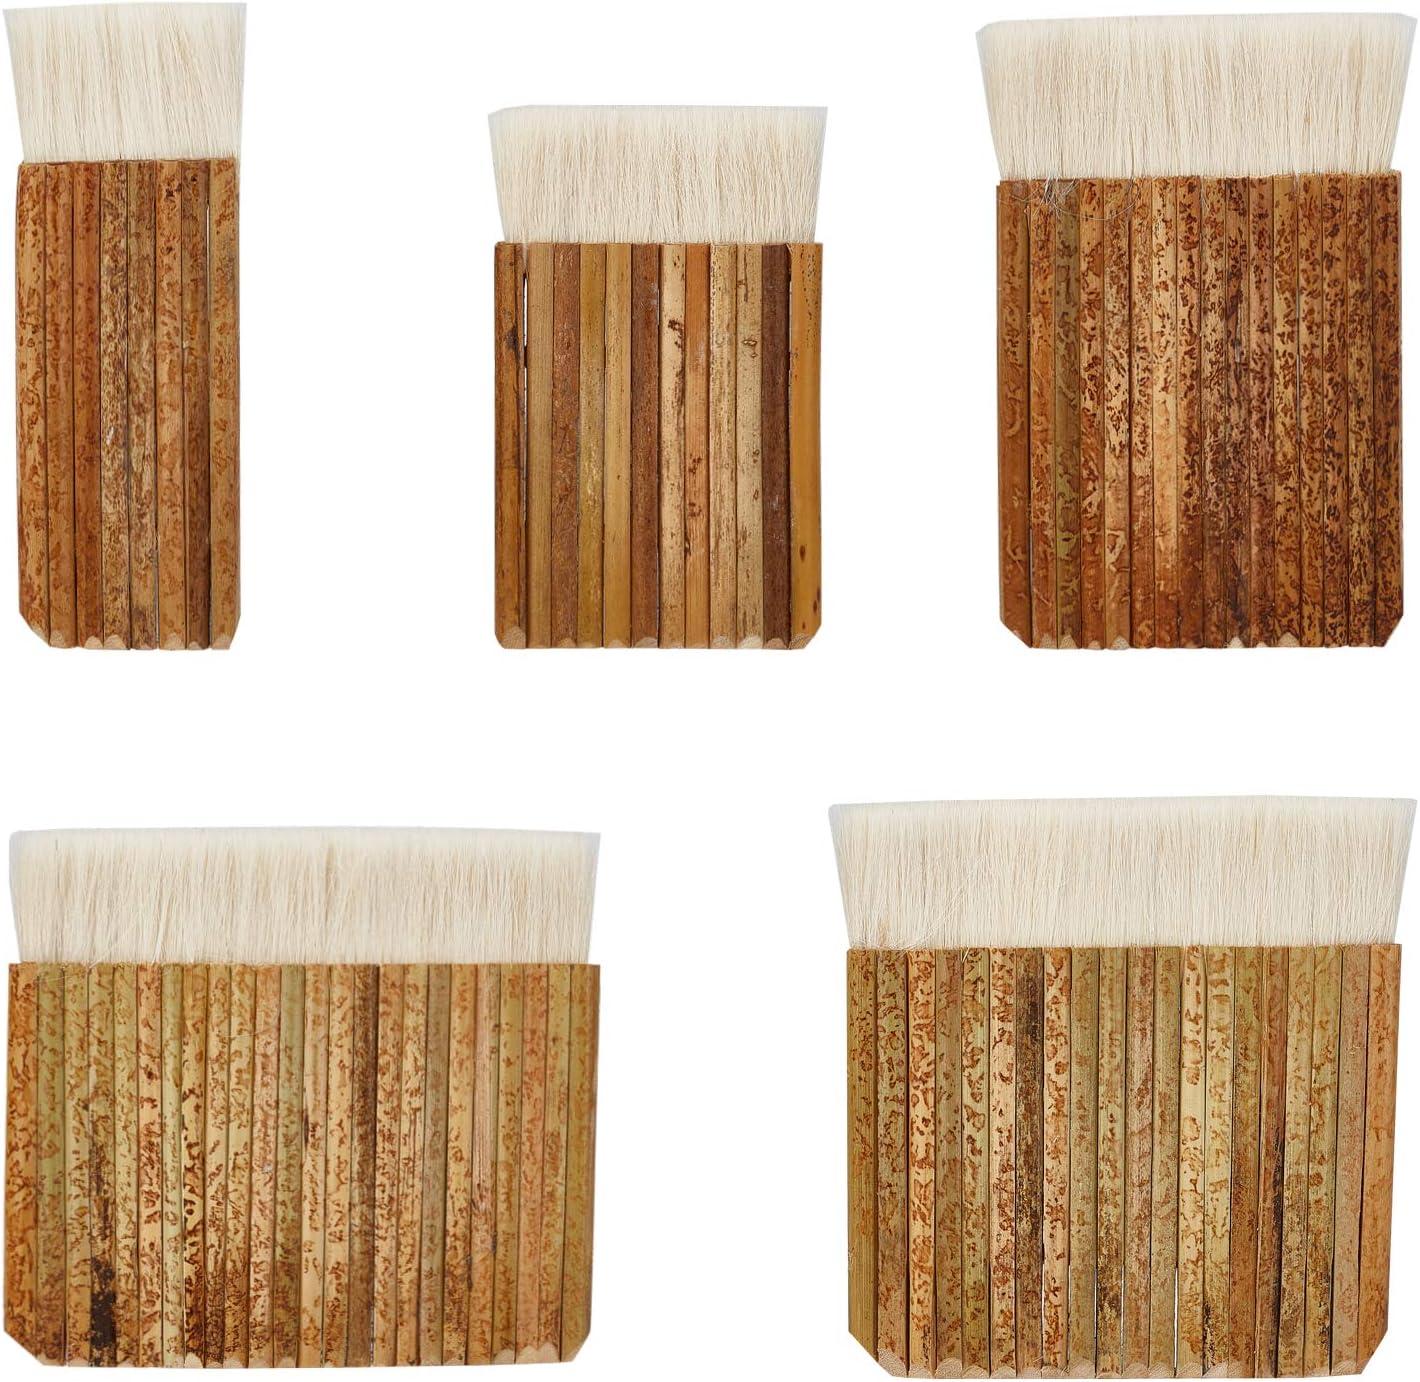 PandaHall 5 tamaños de cepillos de acuarela de merluza con mango de bambú para lavado de horno, acuarela, limpieza de polvo, cerámica, pintura de cerámica